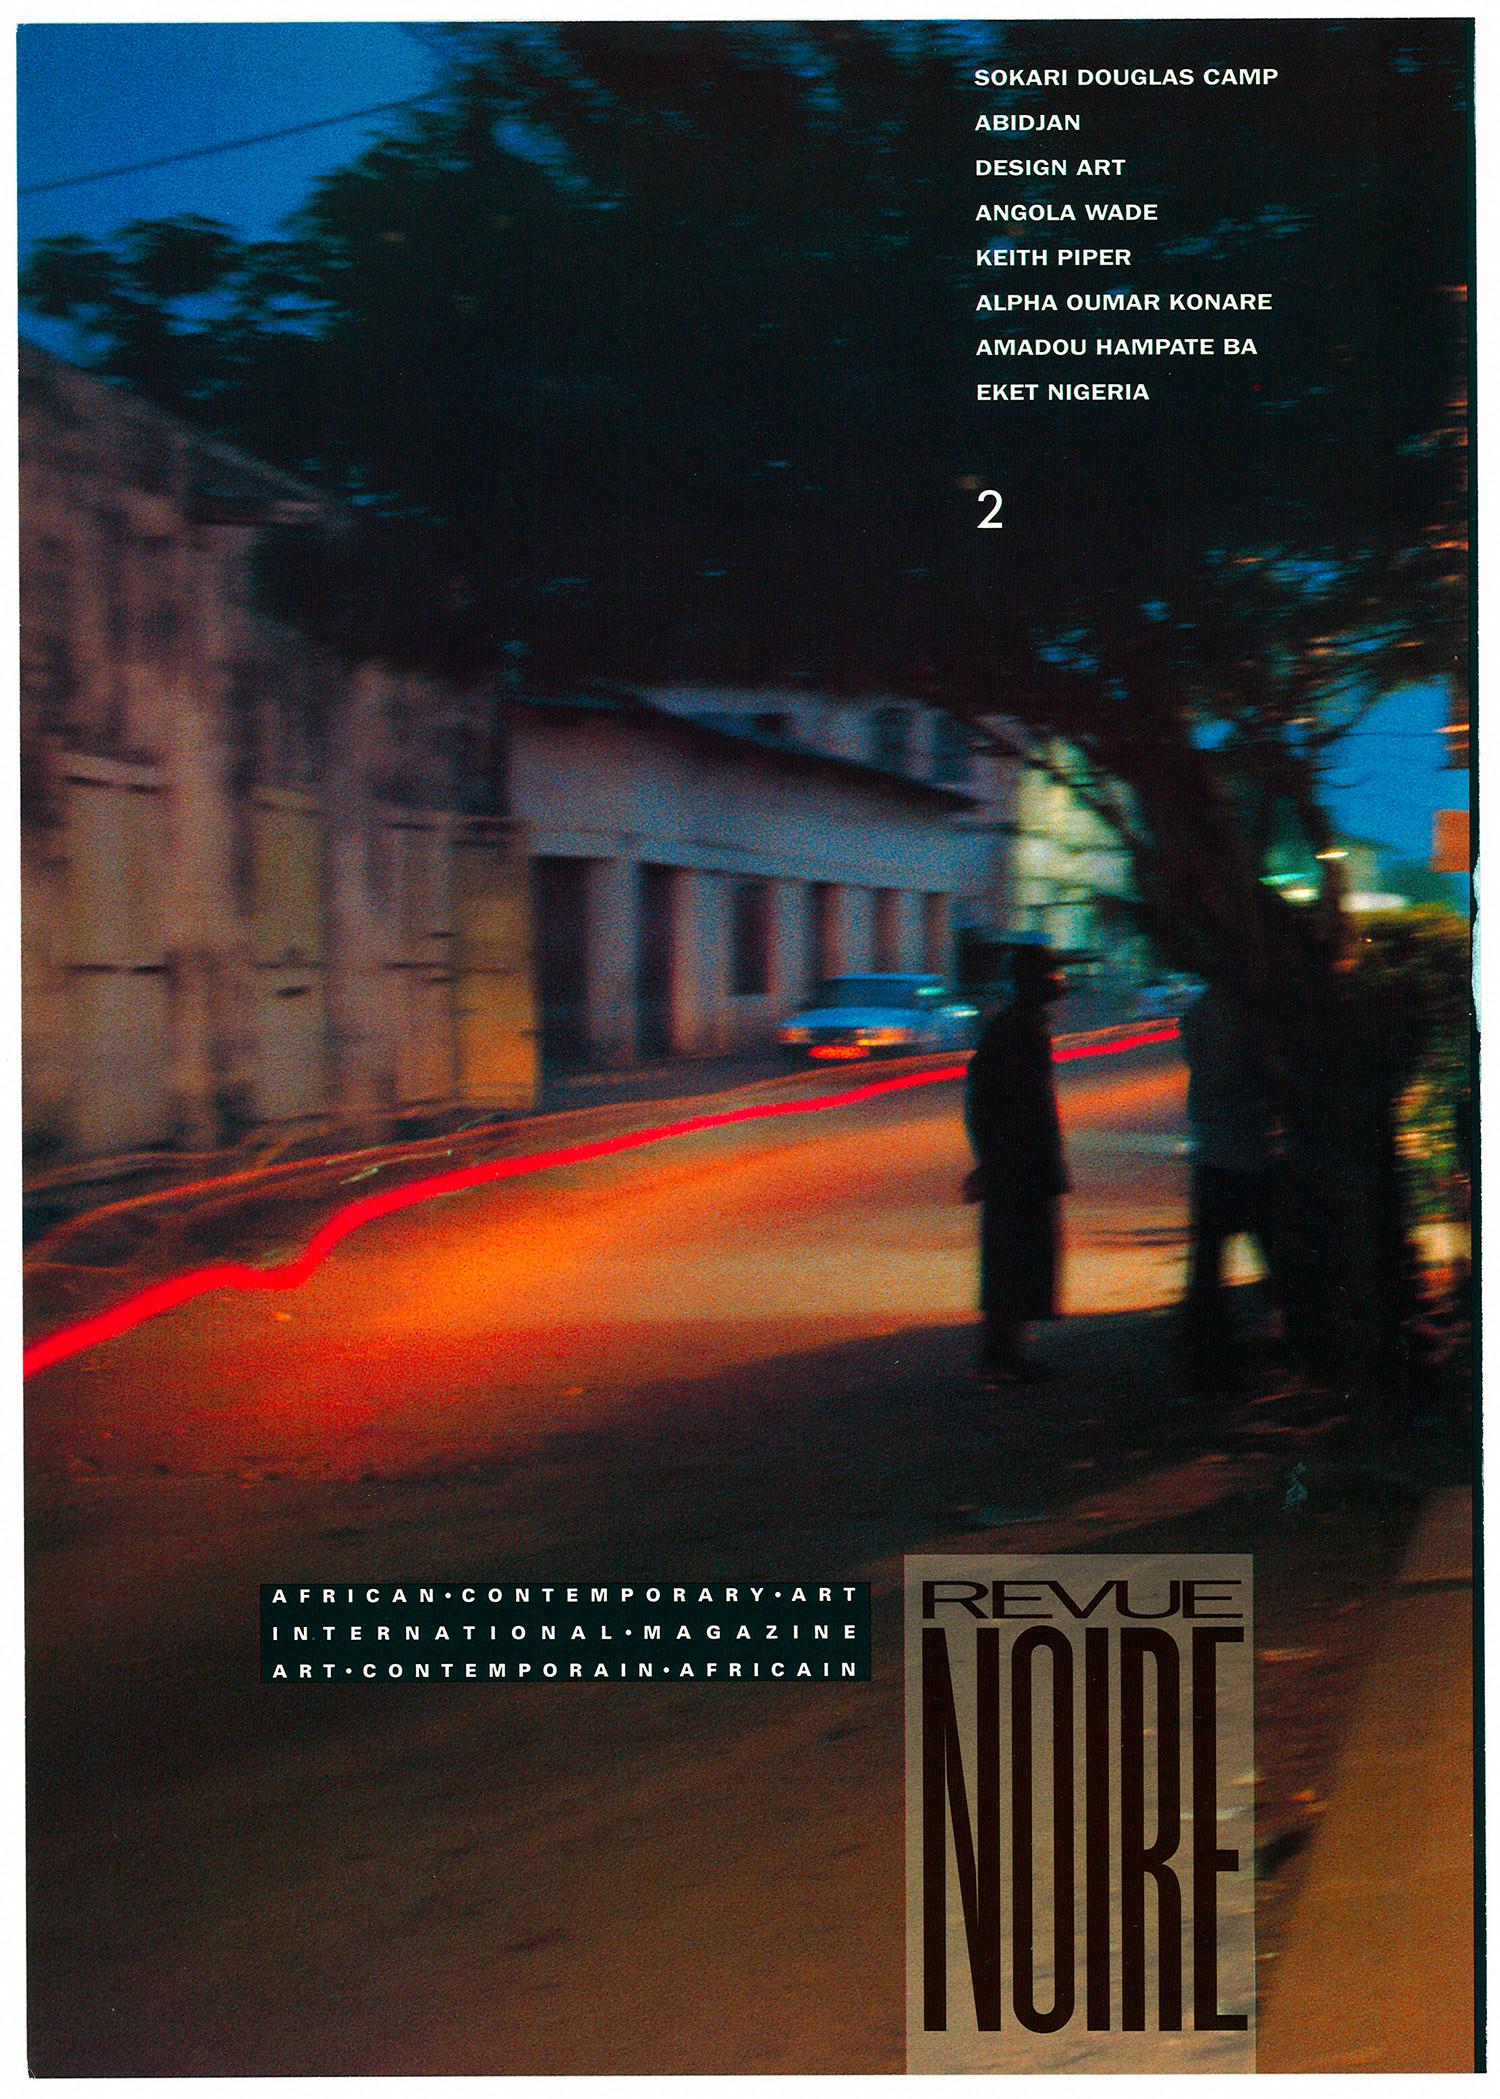 Pages du Revue Noire 02 : Abidjan, Sokary Douglas Camp, UK-Nigeria